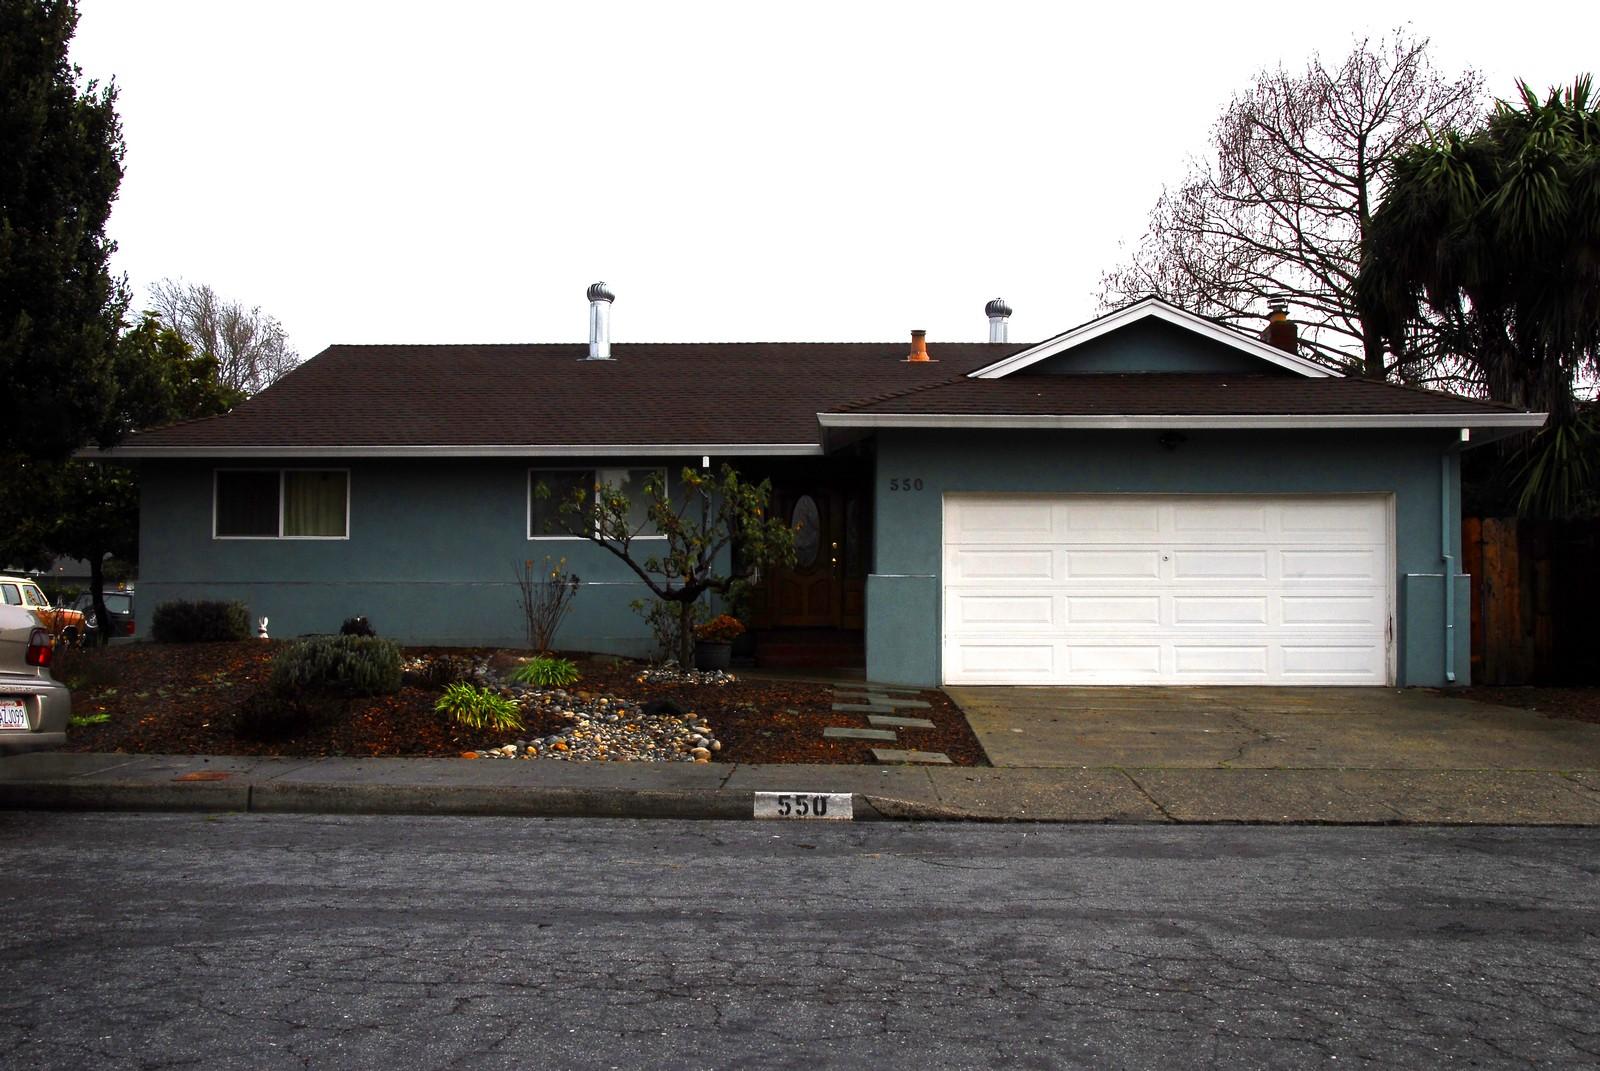 Single Family Home for Sale at 550 McFall Court Santa Rosa, California 95401 United States